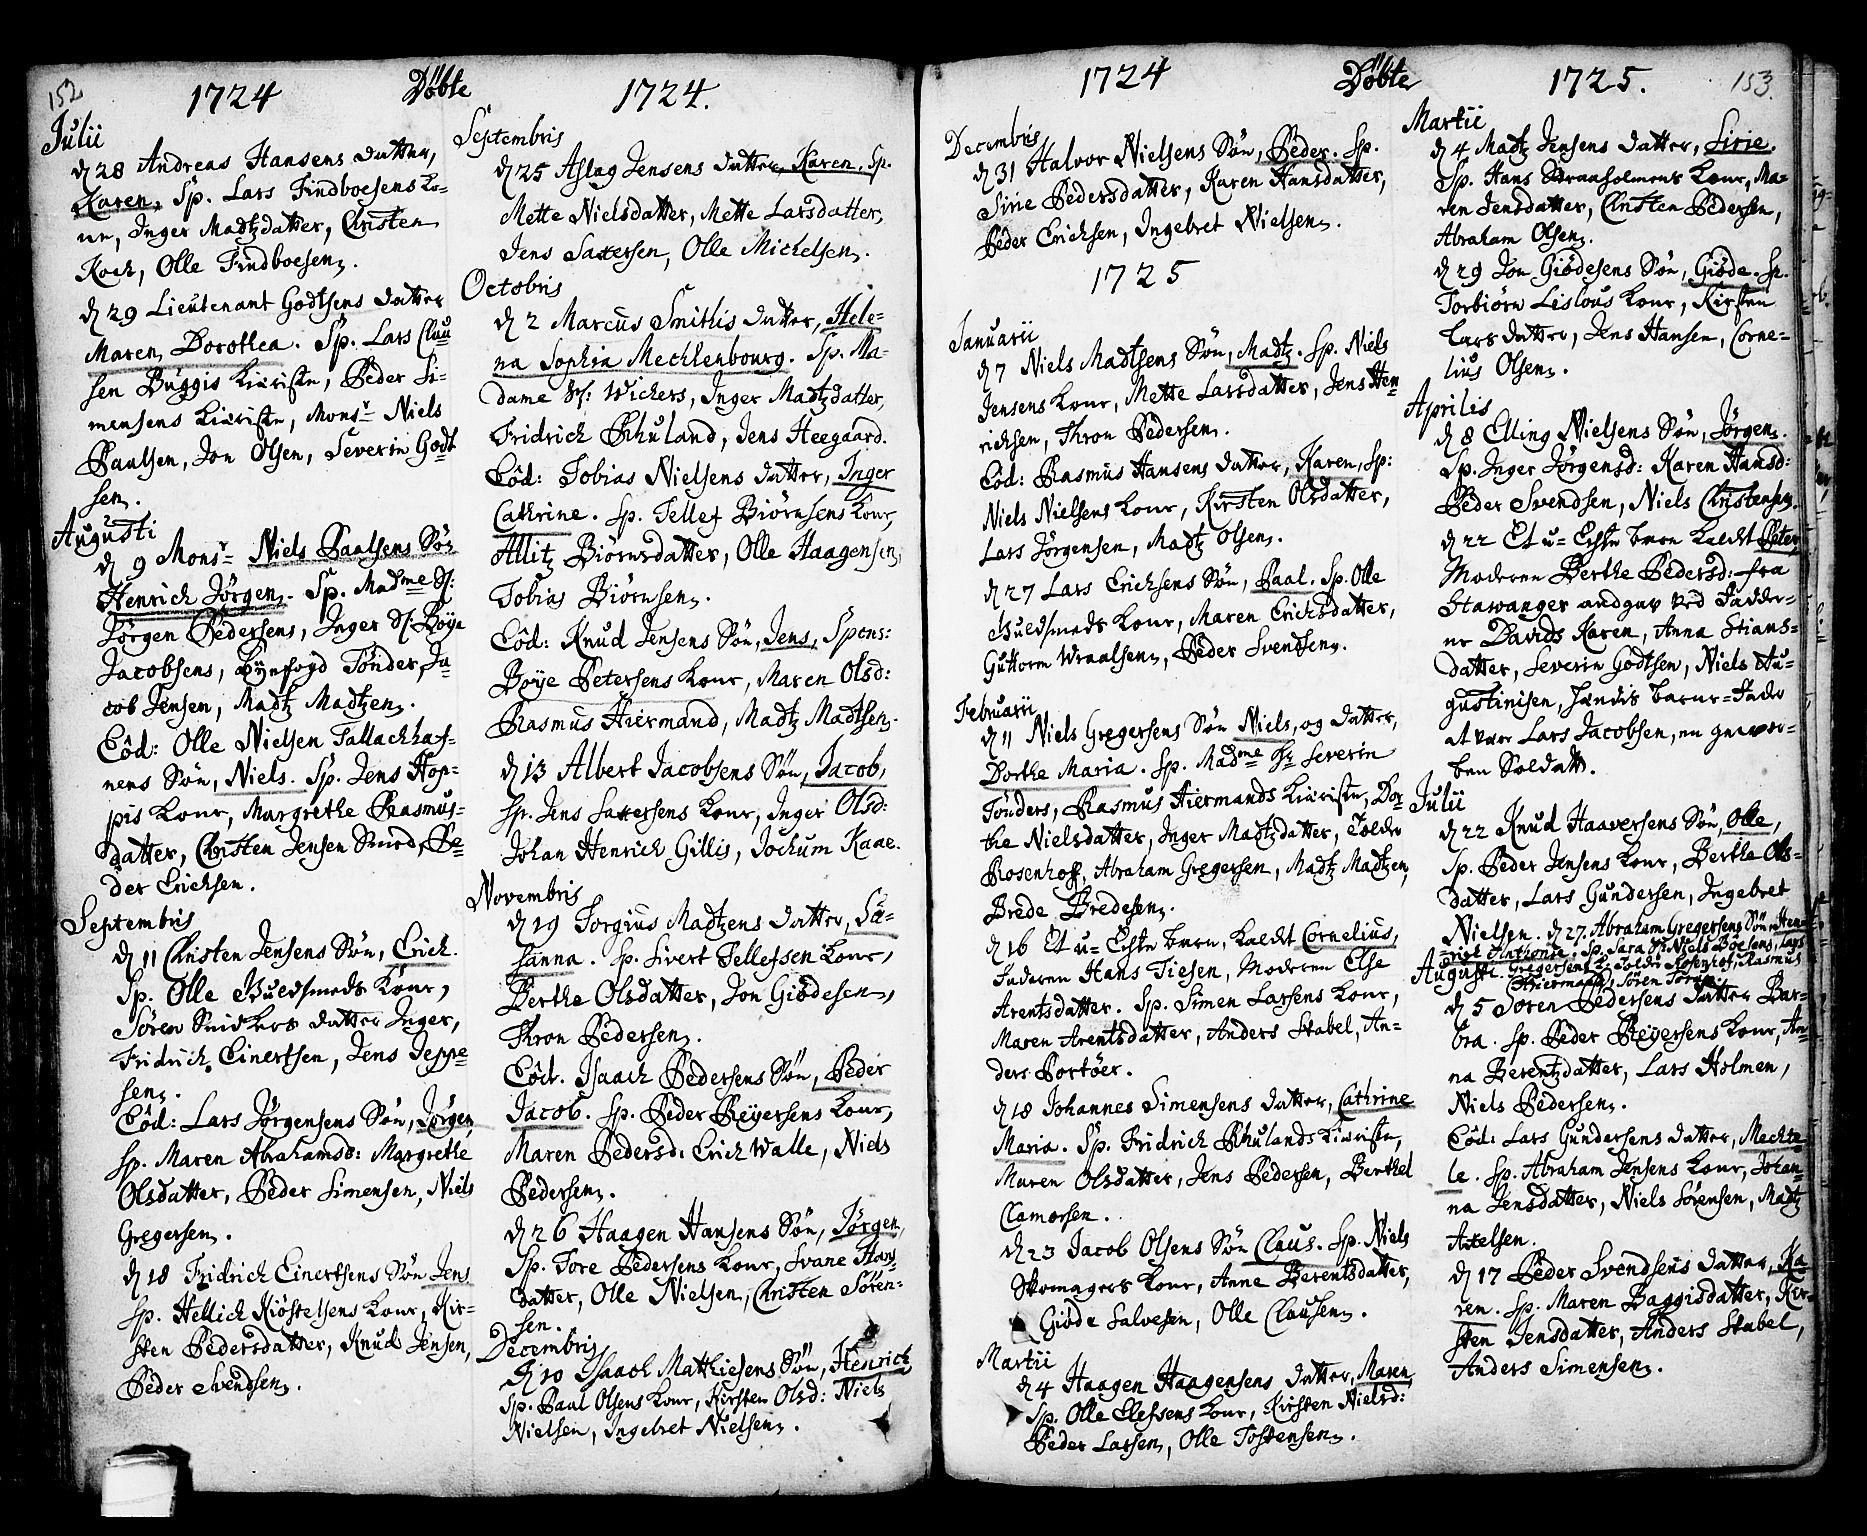 SAKO, Kragerø kirkebøker, F/Fa/L0001: Ministerialbok nr. 1, 1702-1766, s. 152-153